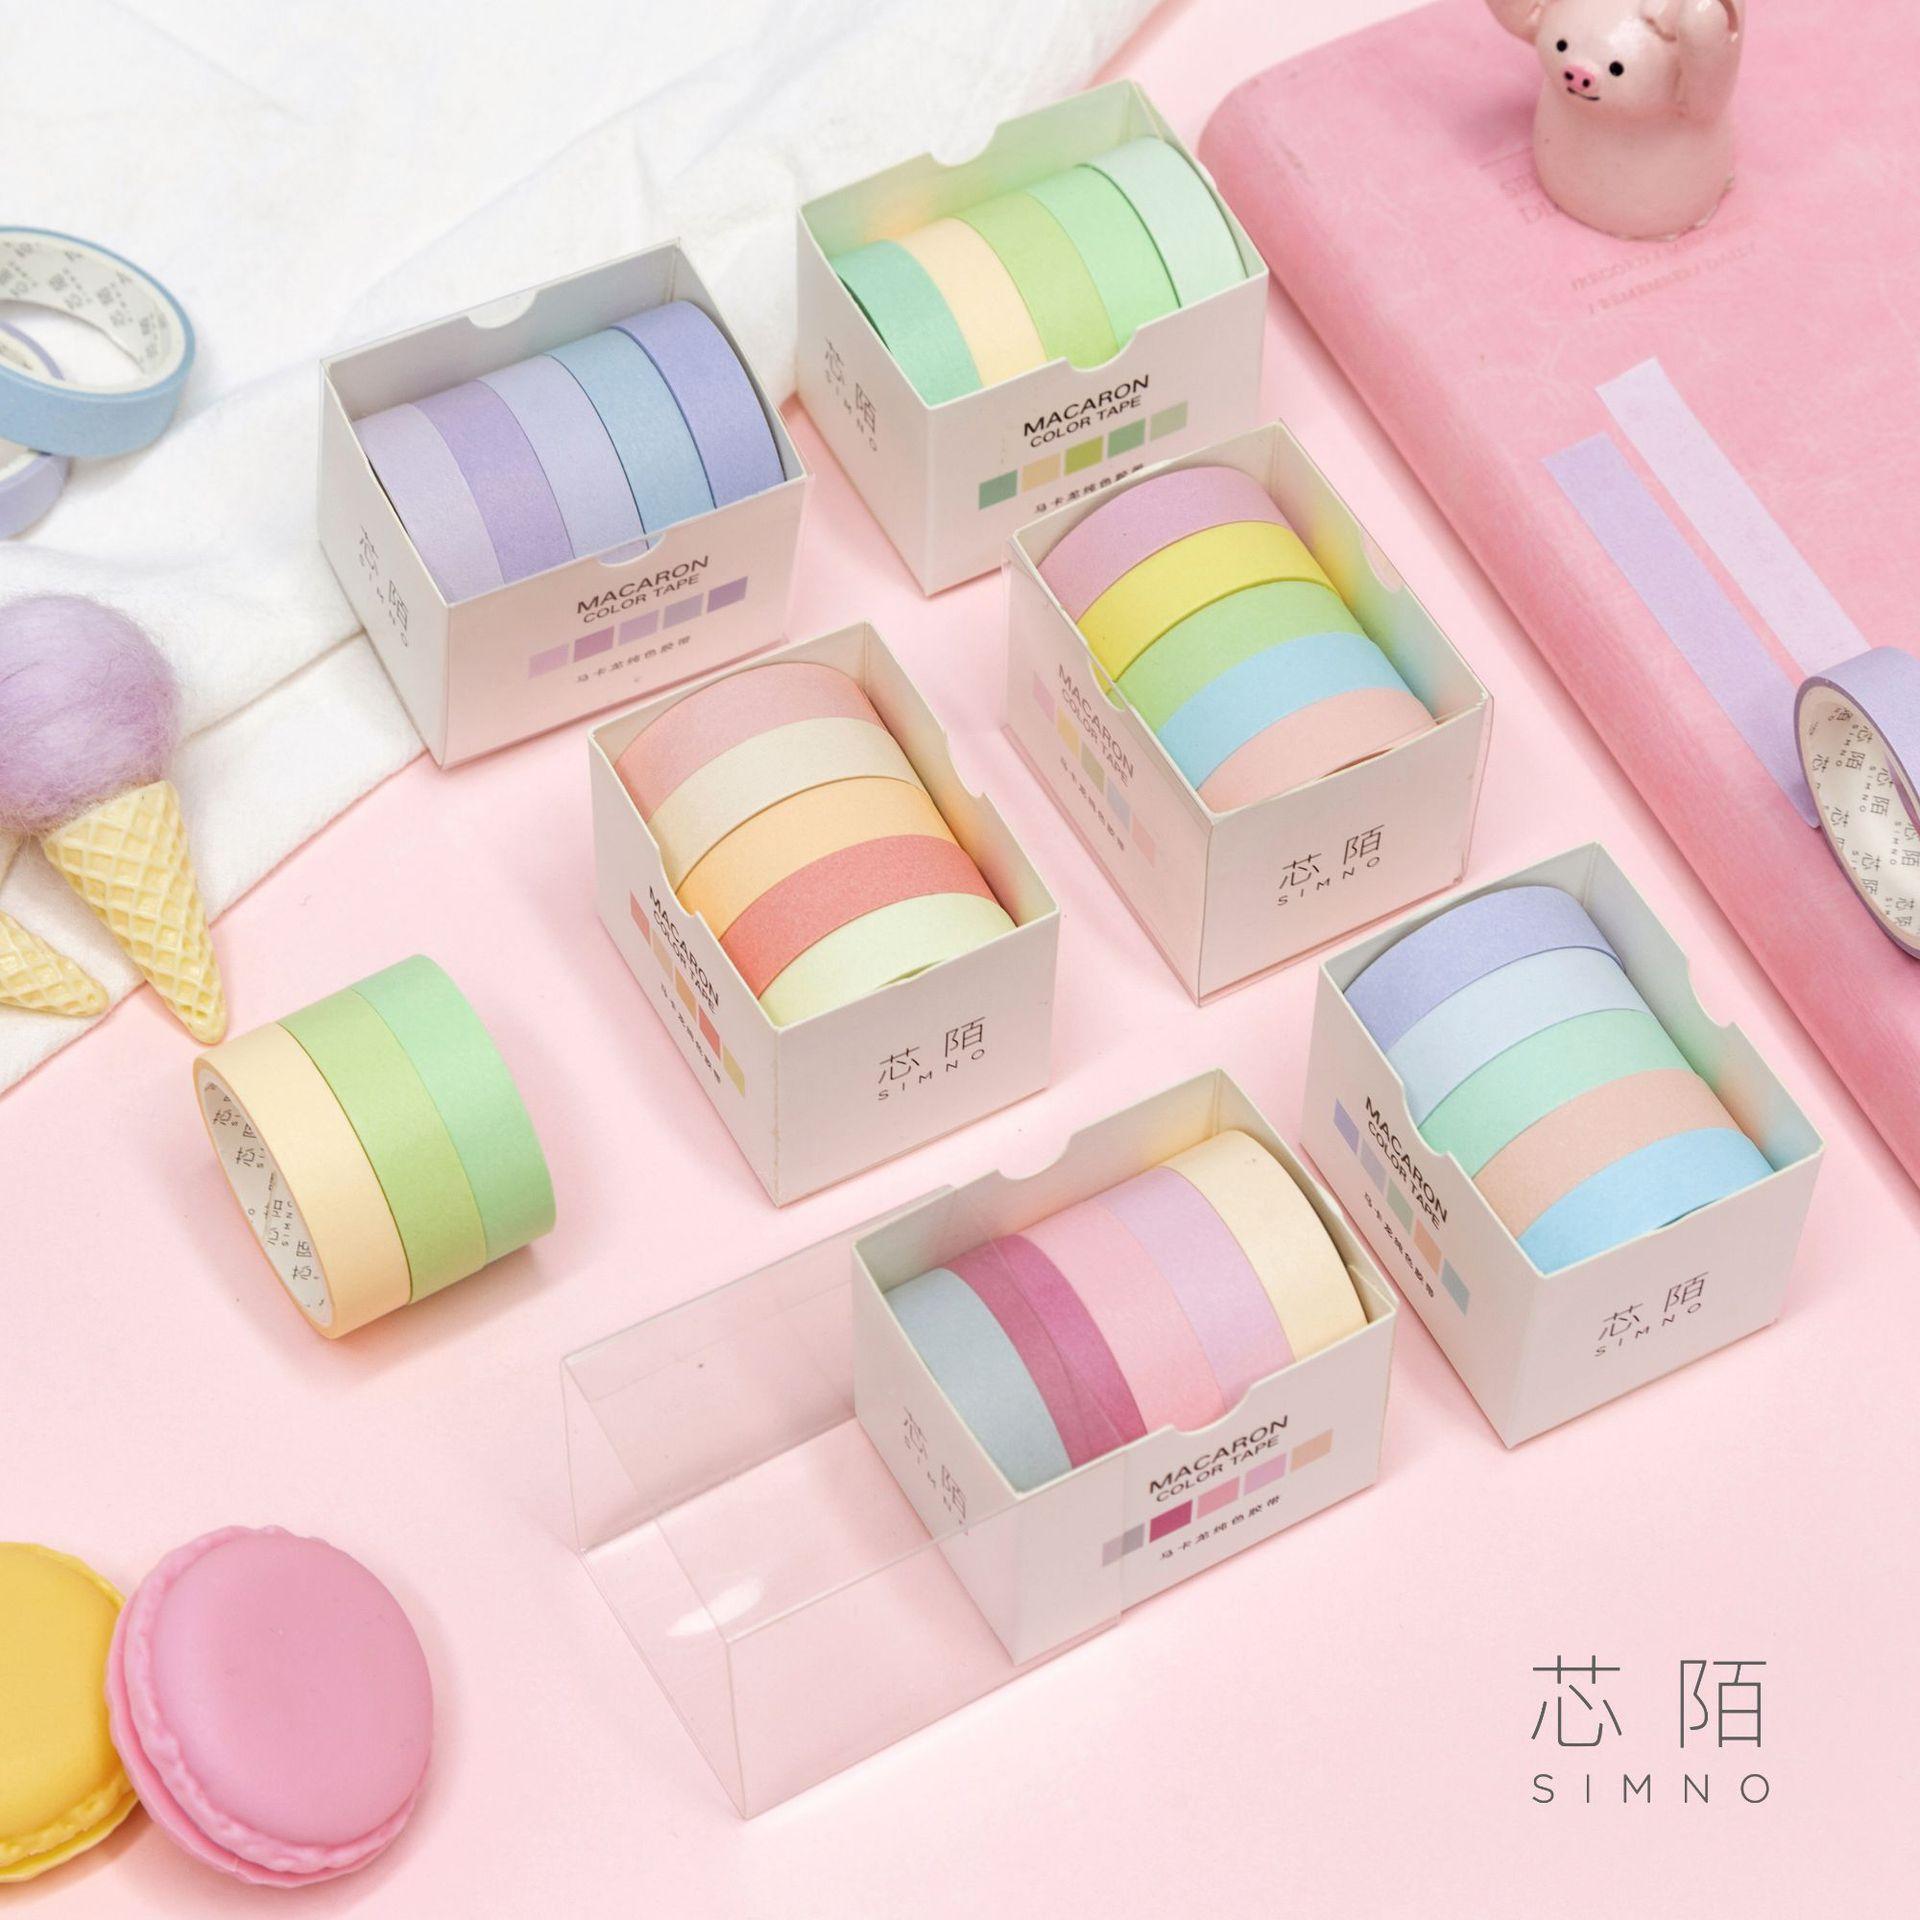 5 Pcs/pack Pure Macaroon Color Base Decorative Washi Tape Set DIY Scrapbooking Masking Craft Tape School Office Supply